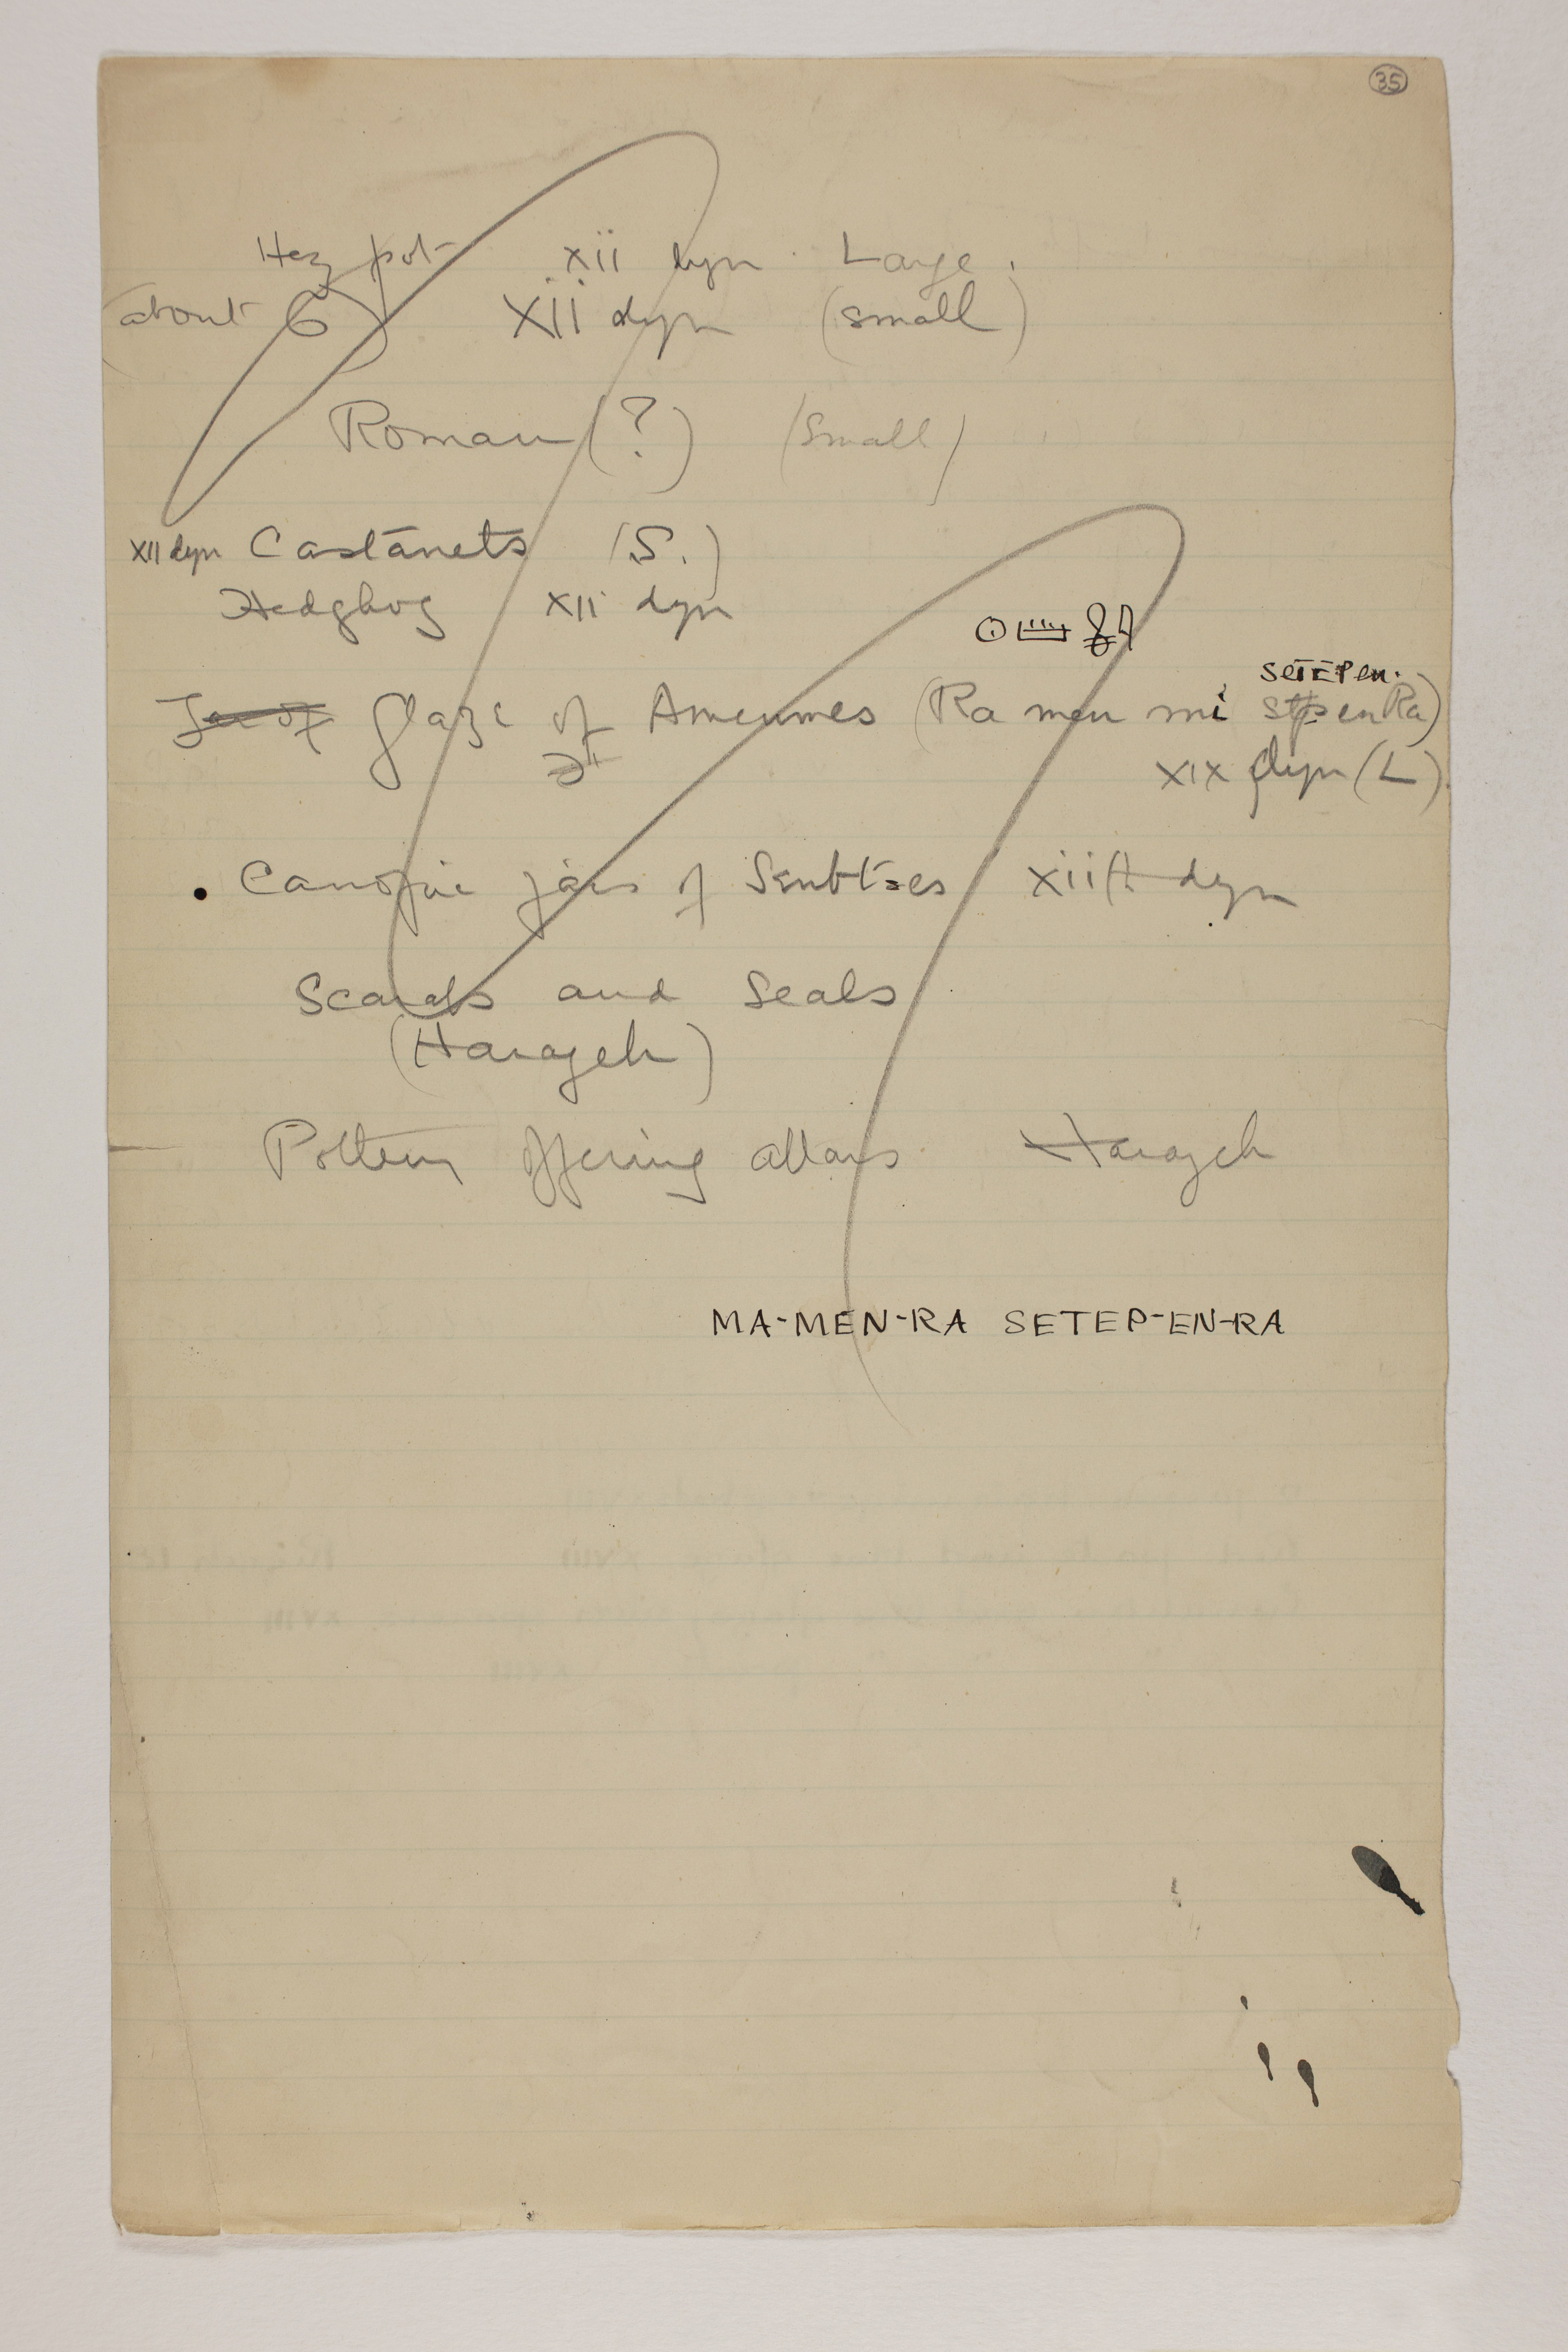 1913-14 Lahun, Haraga Individual institution list  PMA/WFP1/D/22/35.2